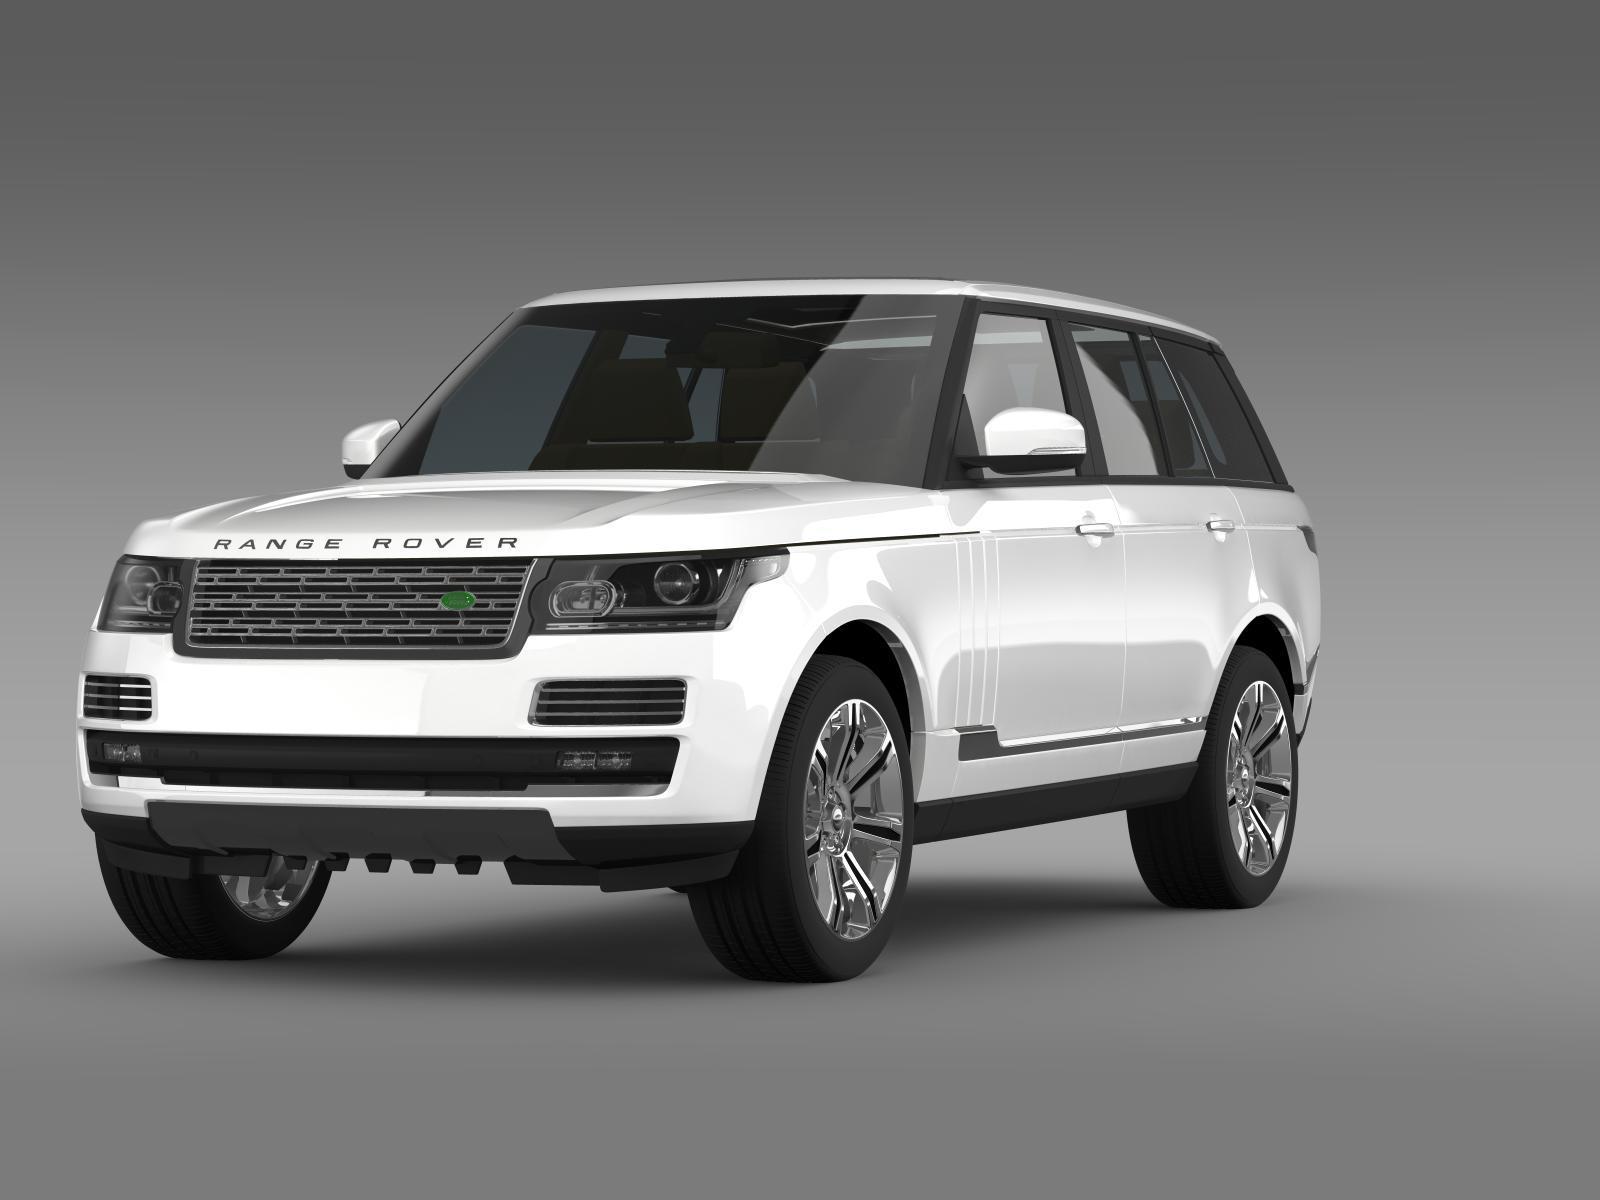 Range Rover Autobiography Black L405 2014 by creator 3d